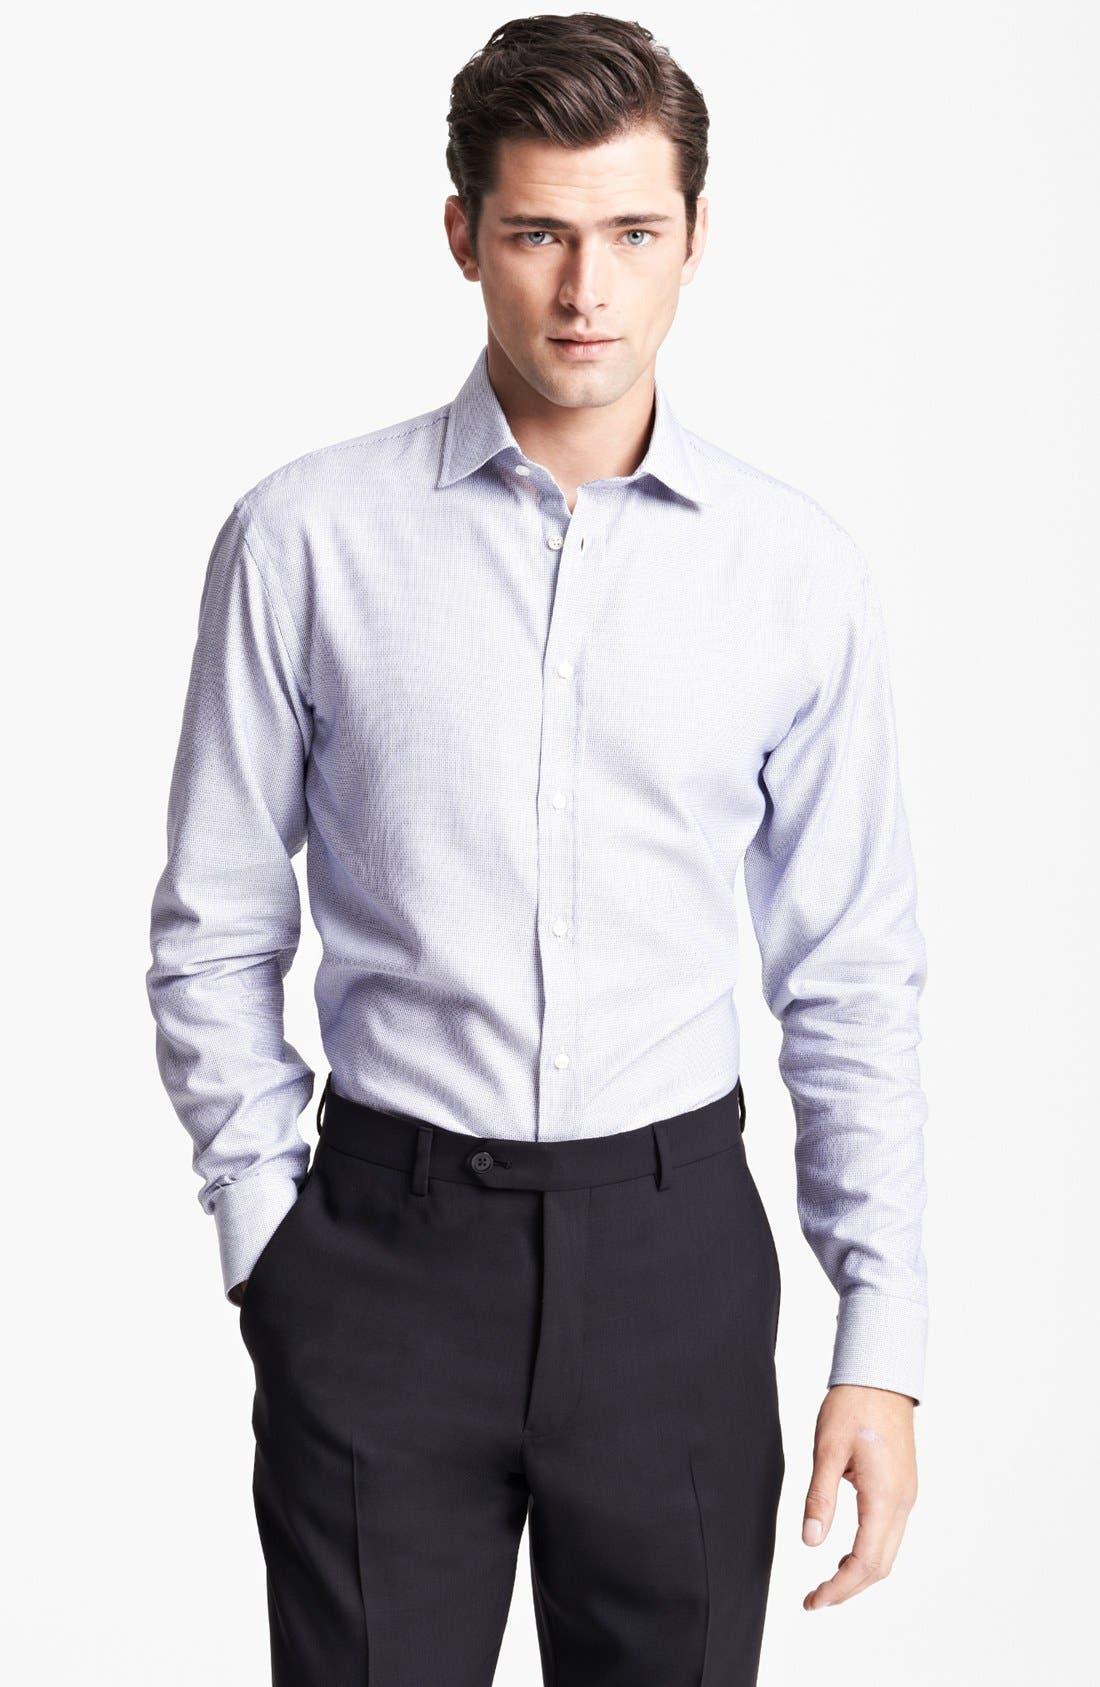 Alternate Image 1 Selected - Armani Collezioni Textured Dress Shirt